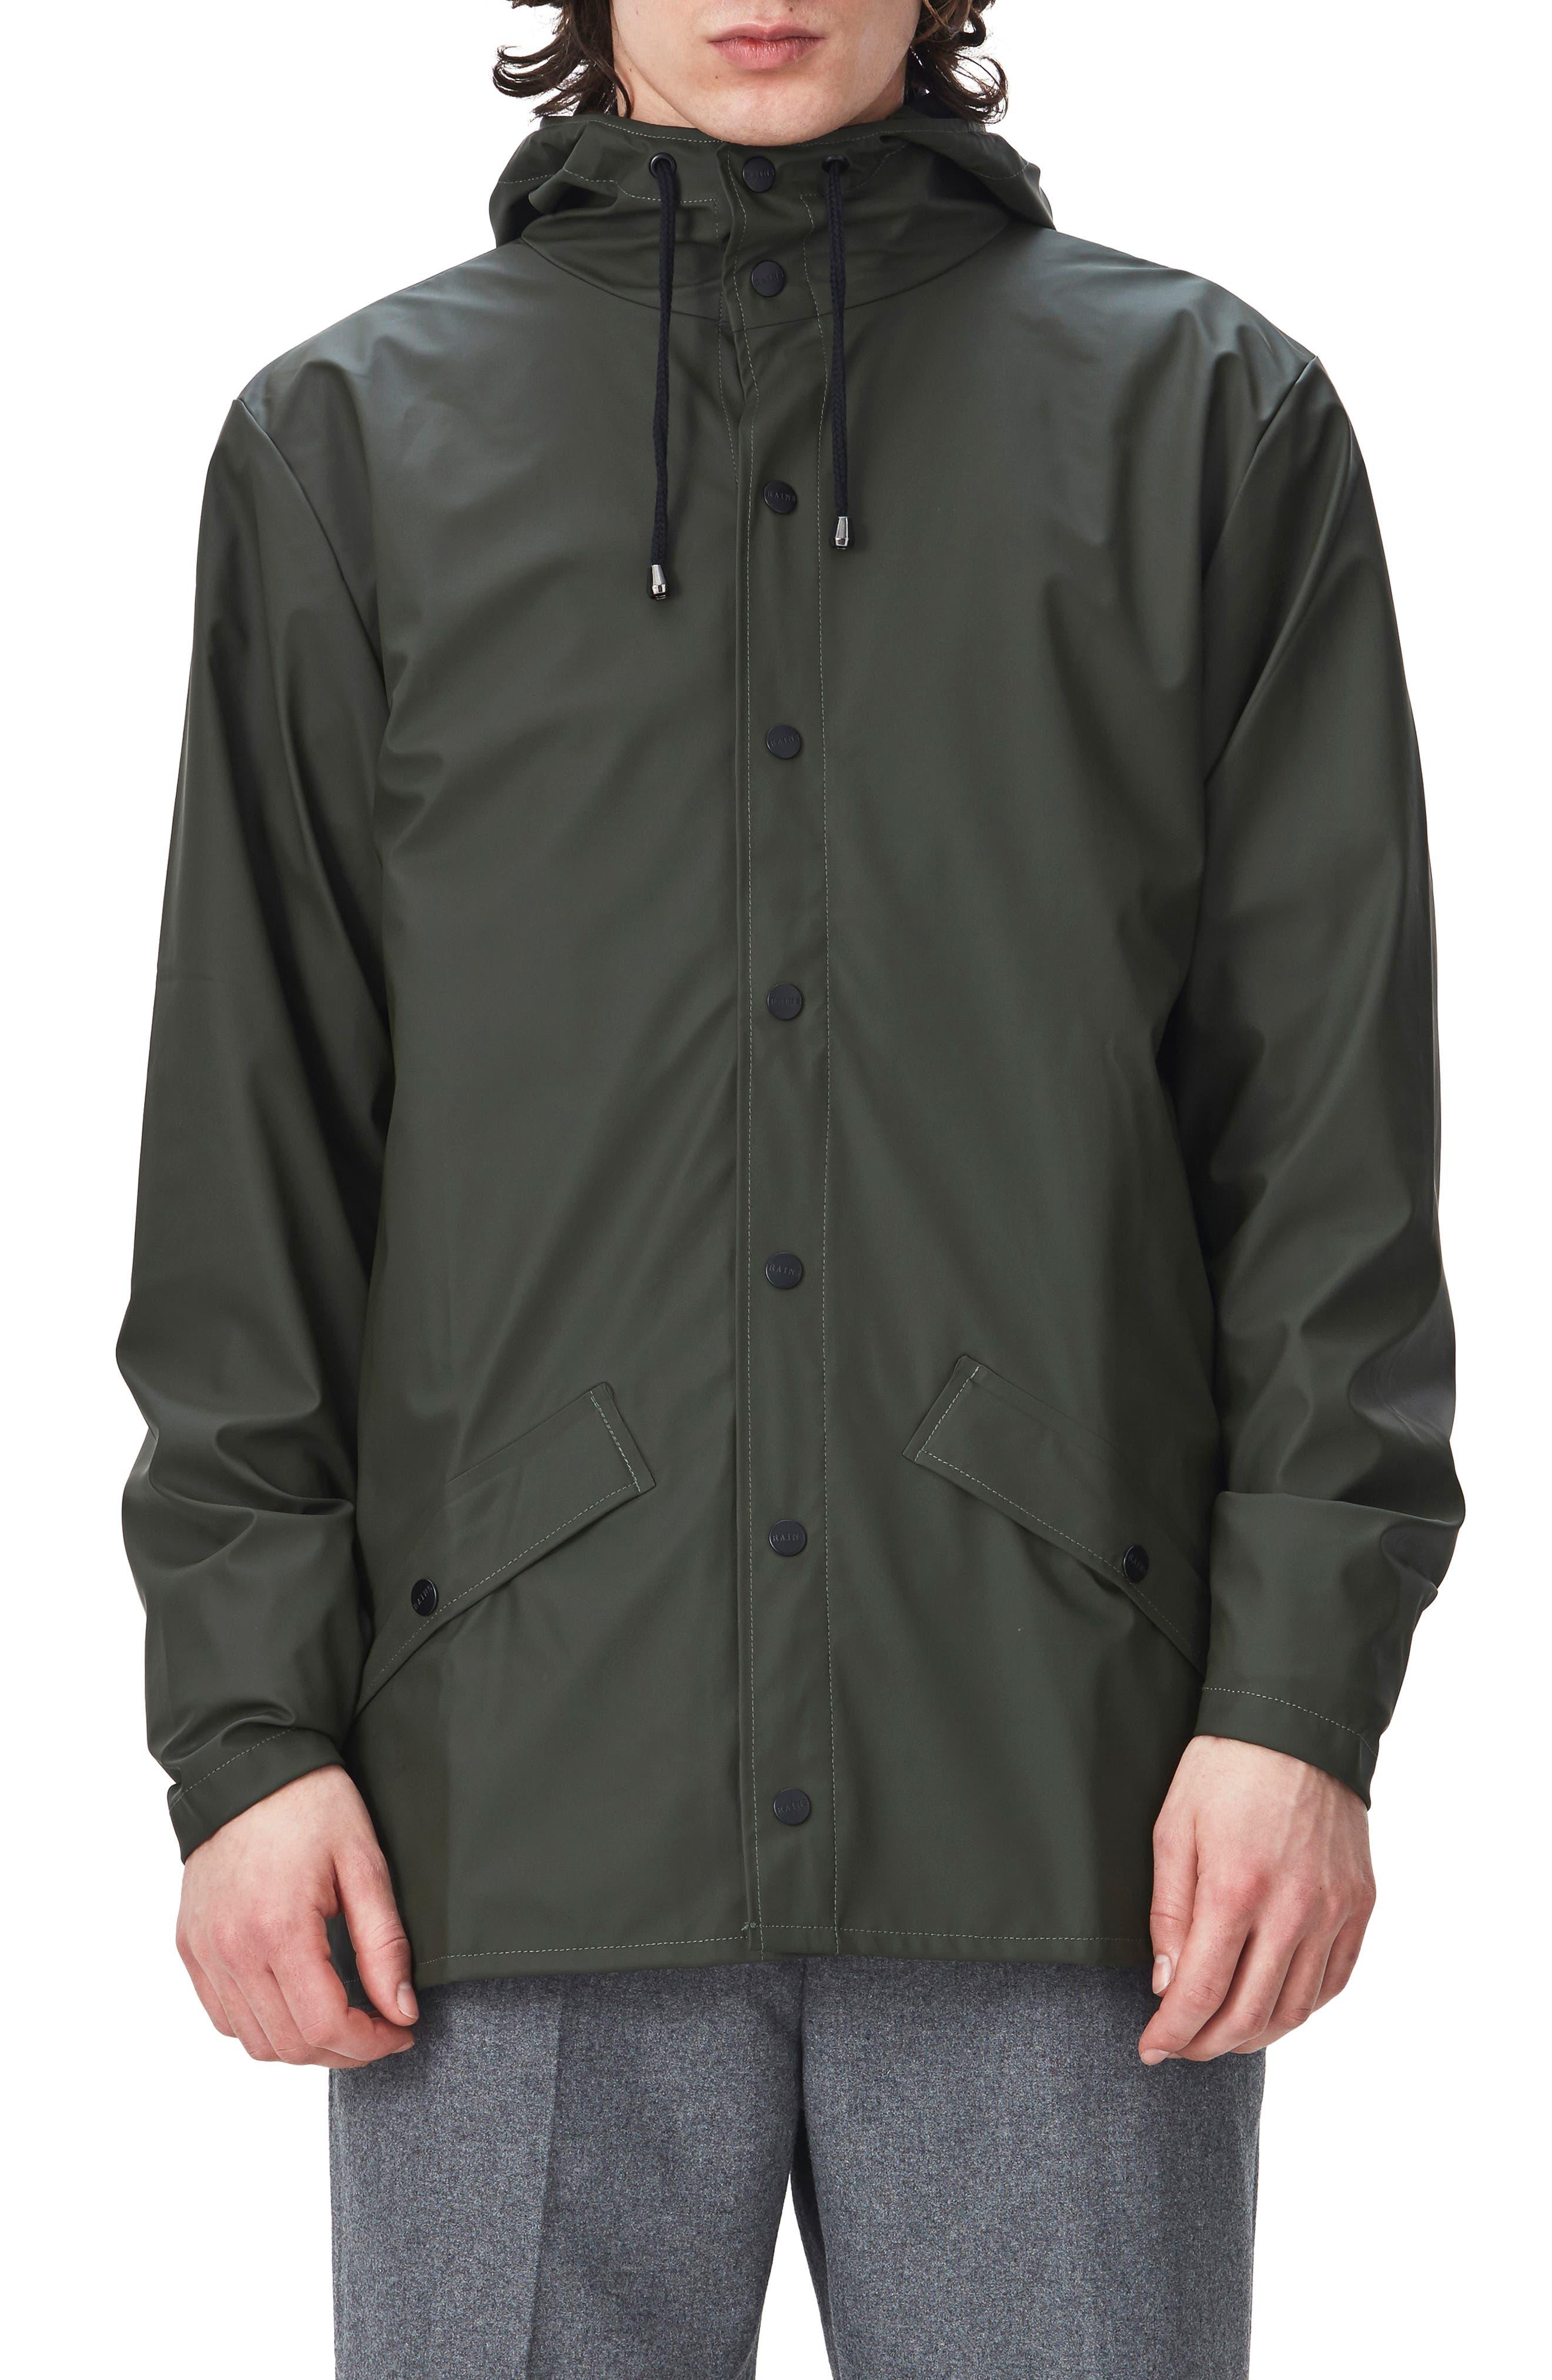 9c52e372c7b4 rain jackets